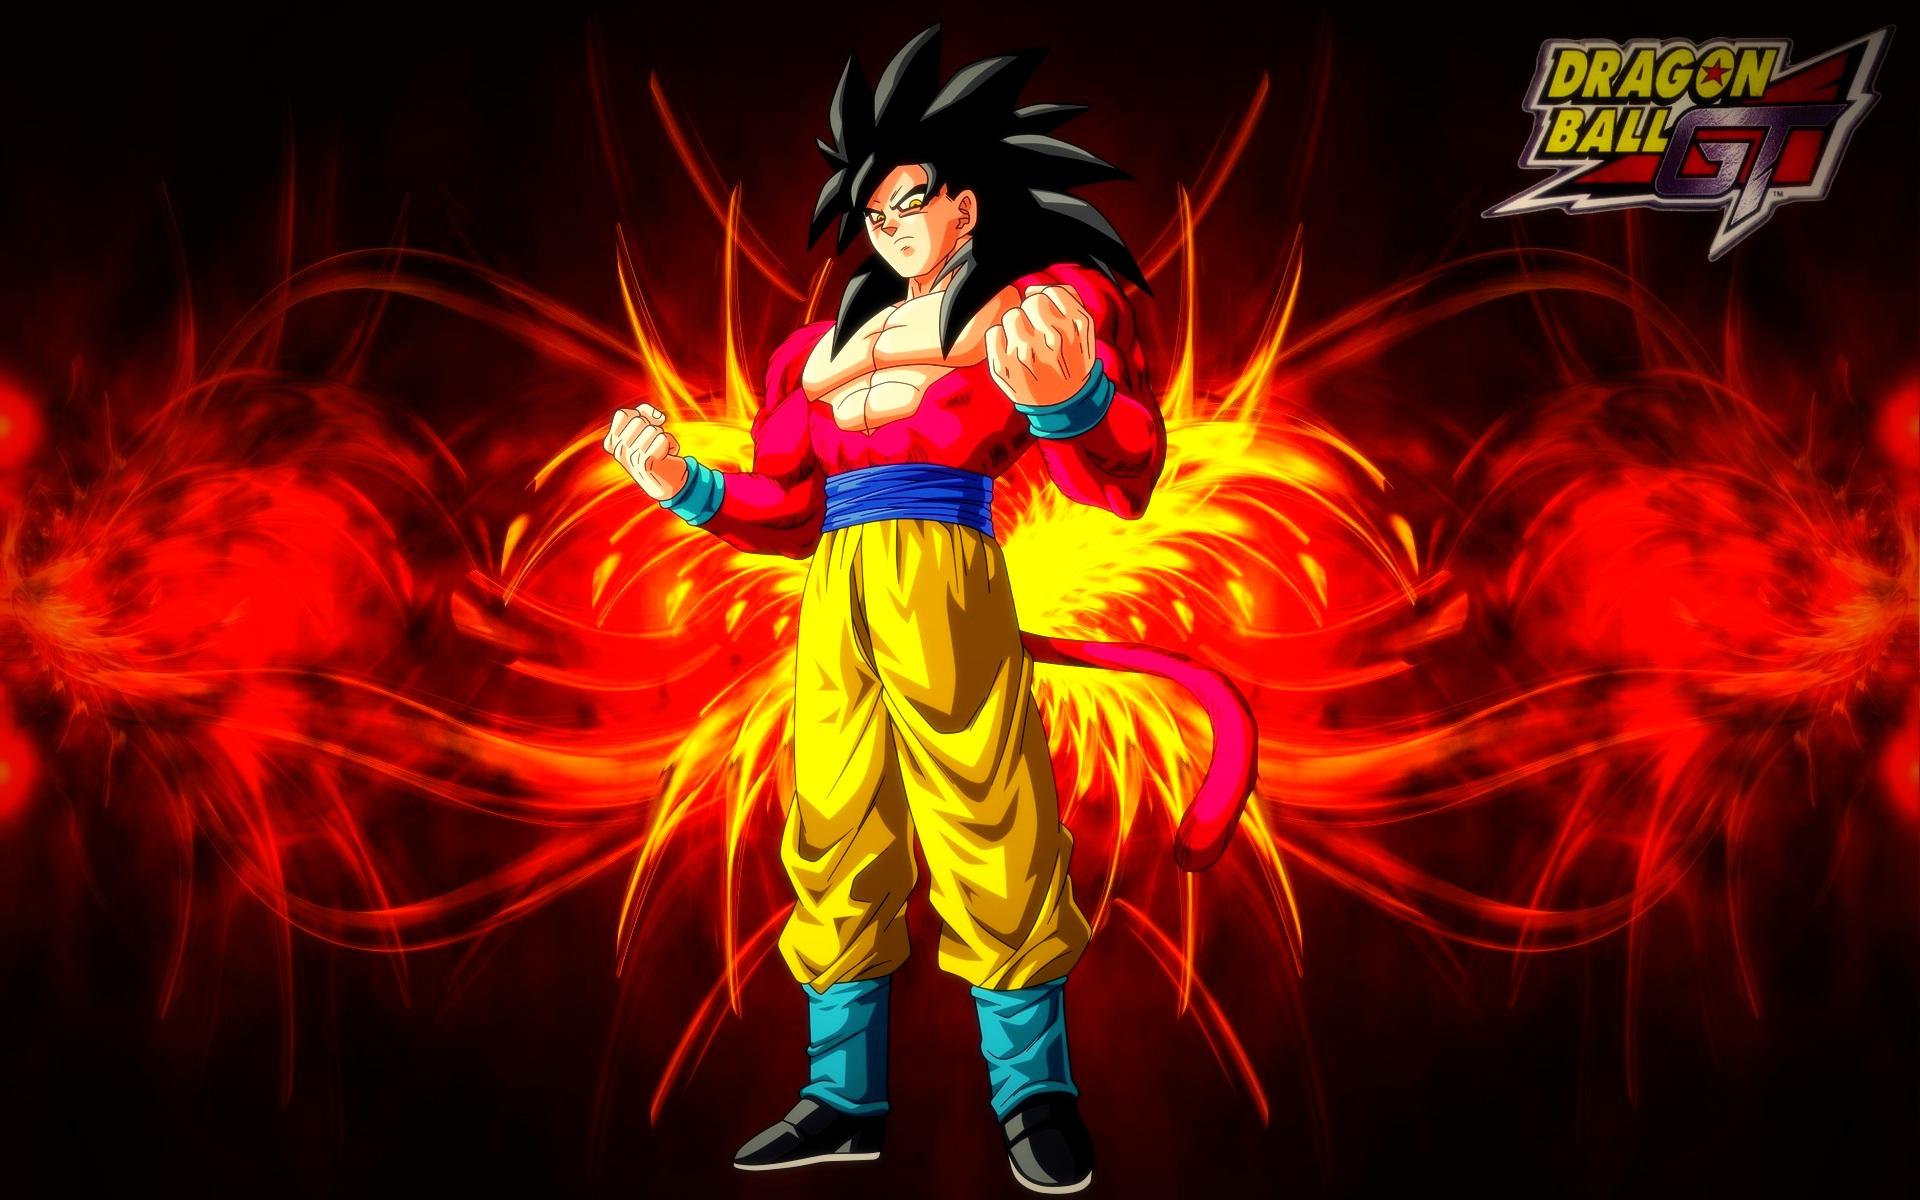 Dragonball Gt Goku Super Saiyan 4 Wallpaper By Blackshadowx306